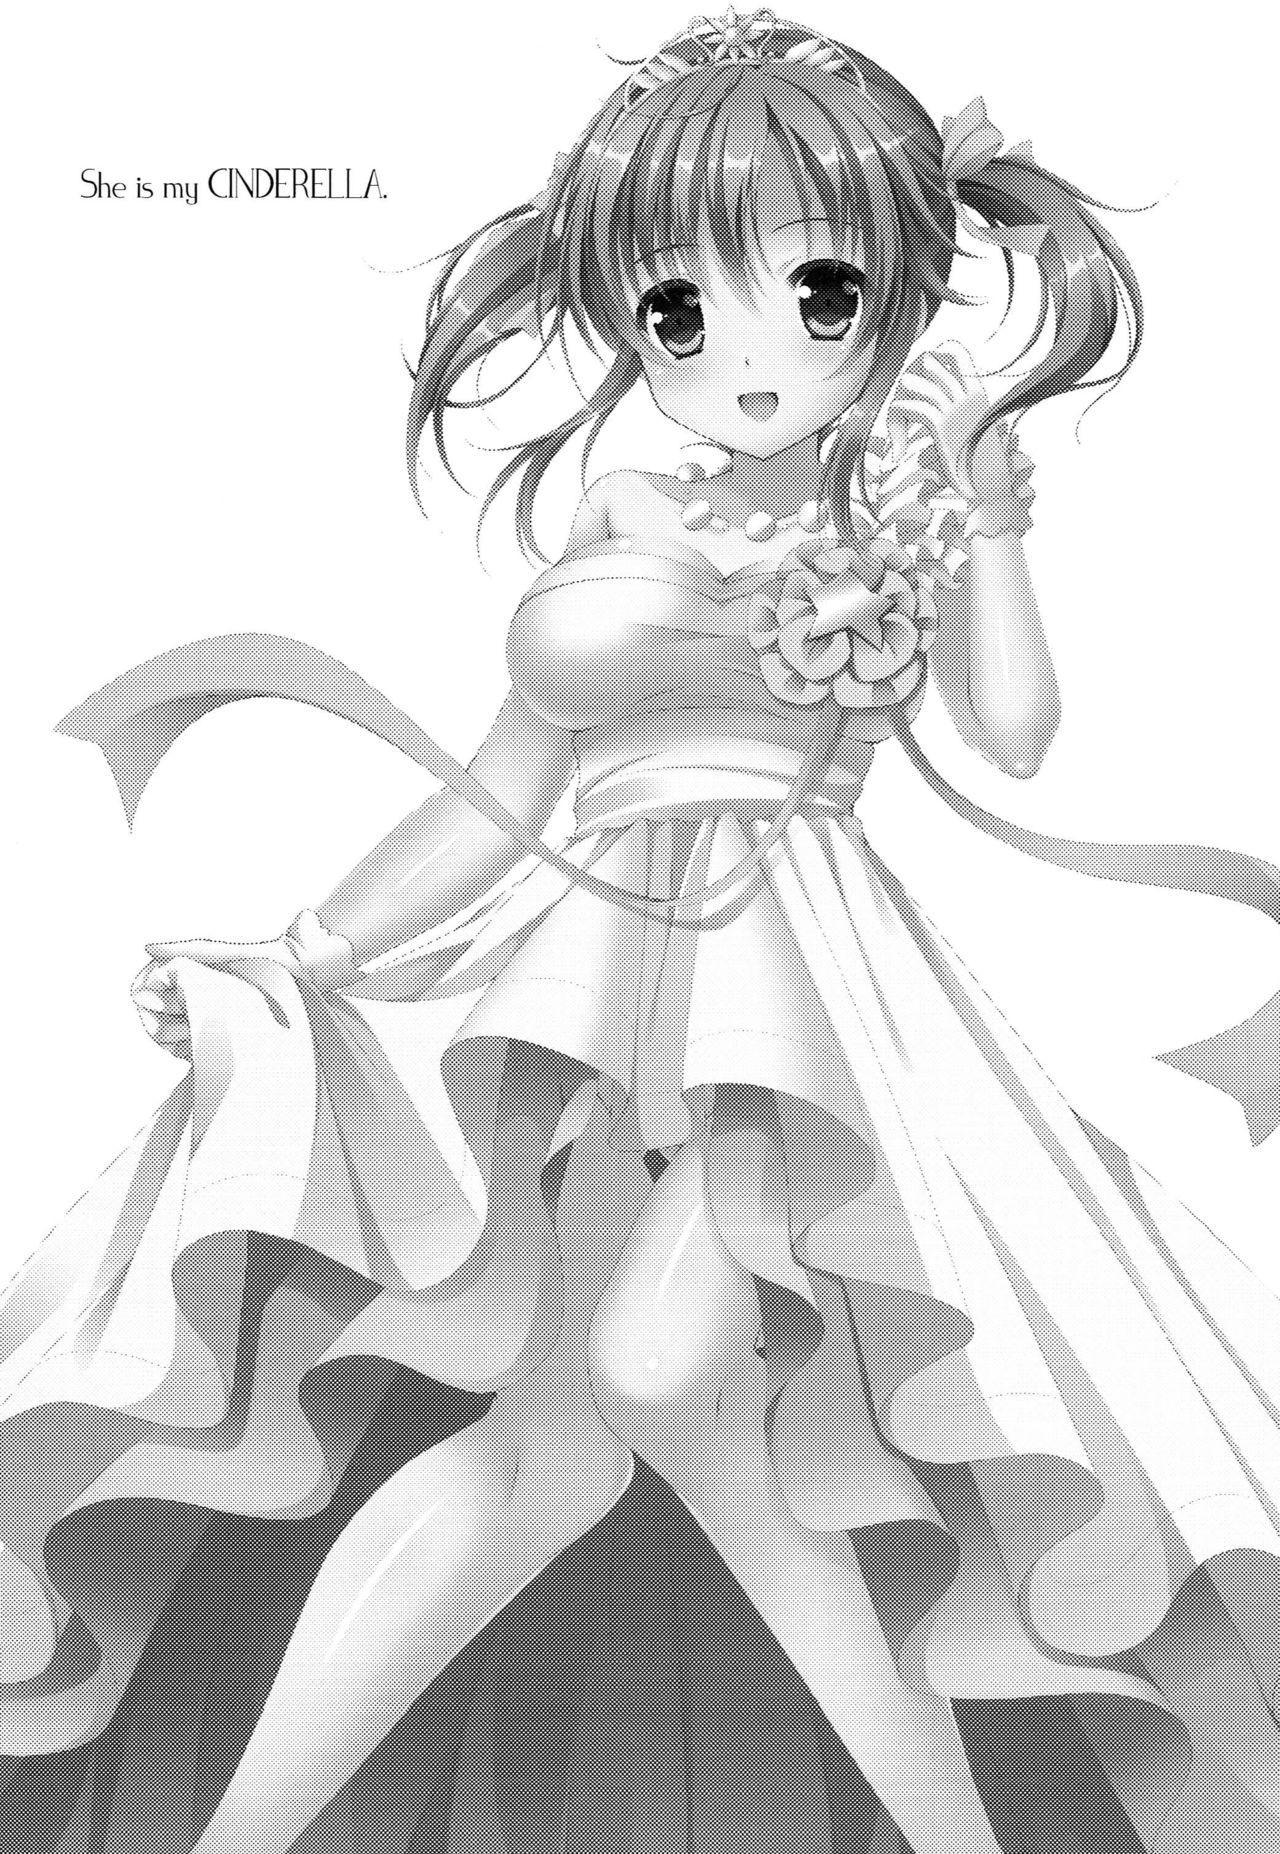 She is my CINDERELLA 1